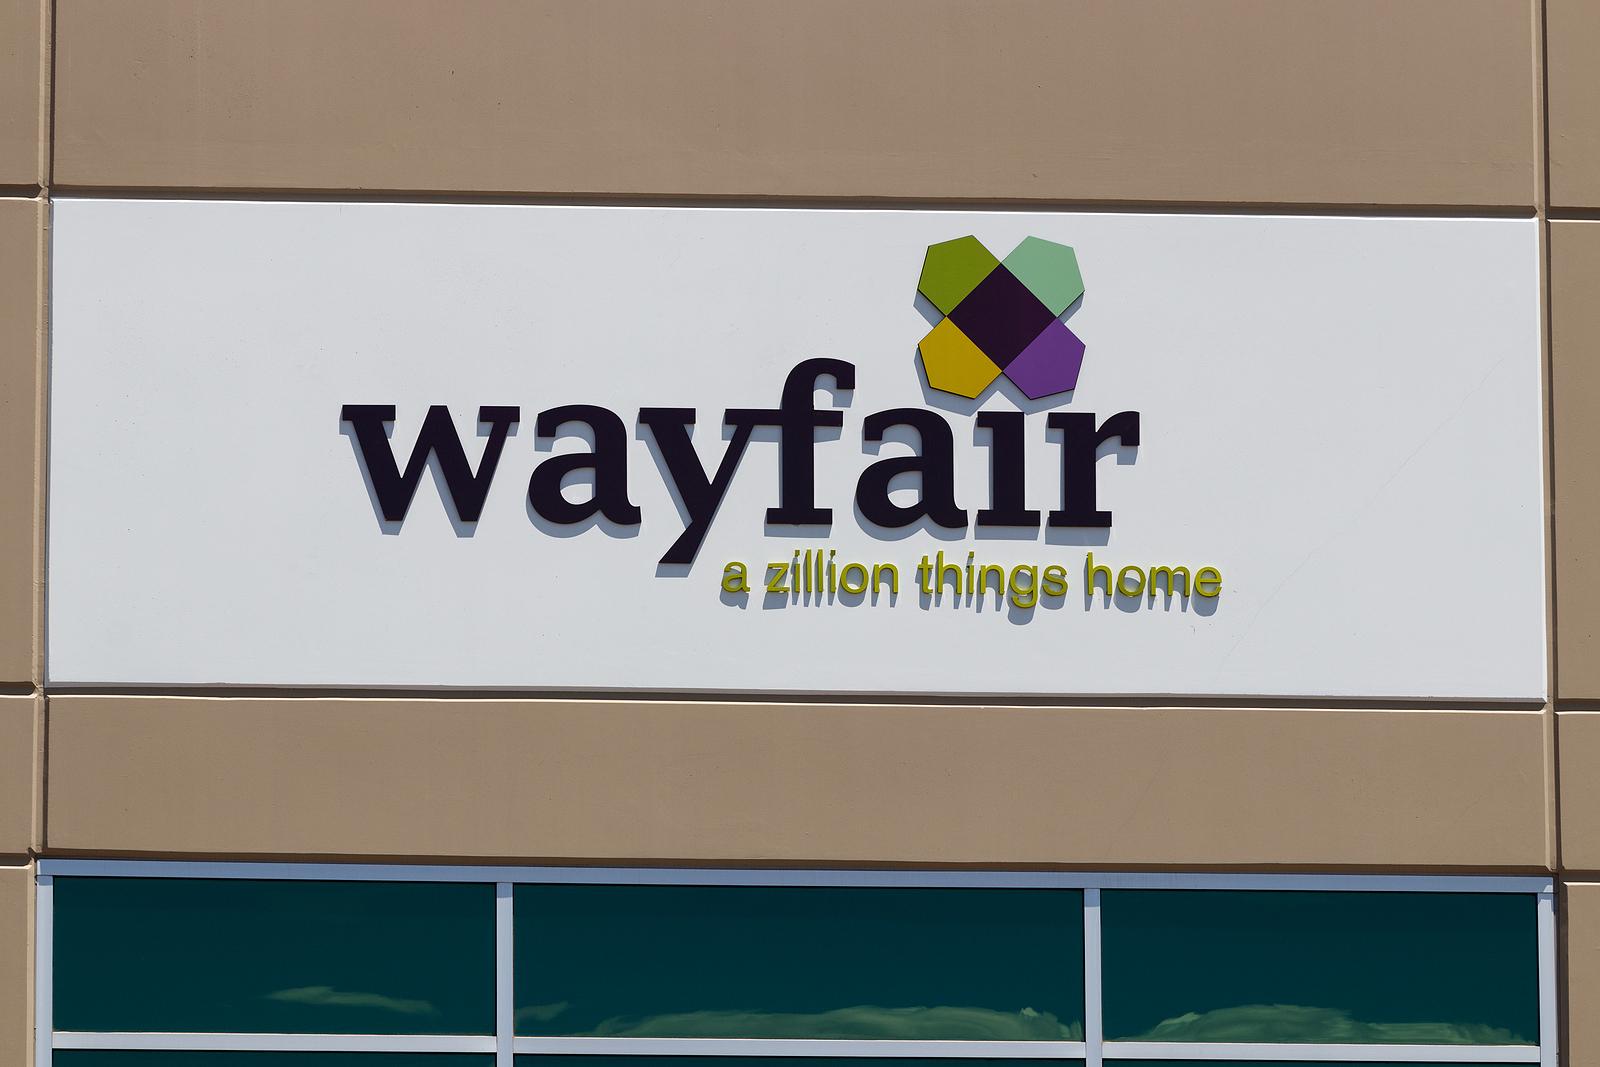 Wayfair W stock news and analysis